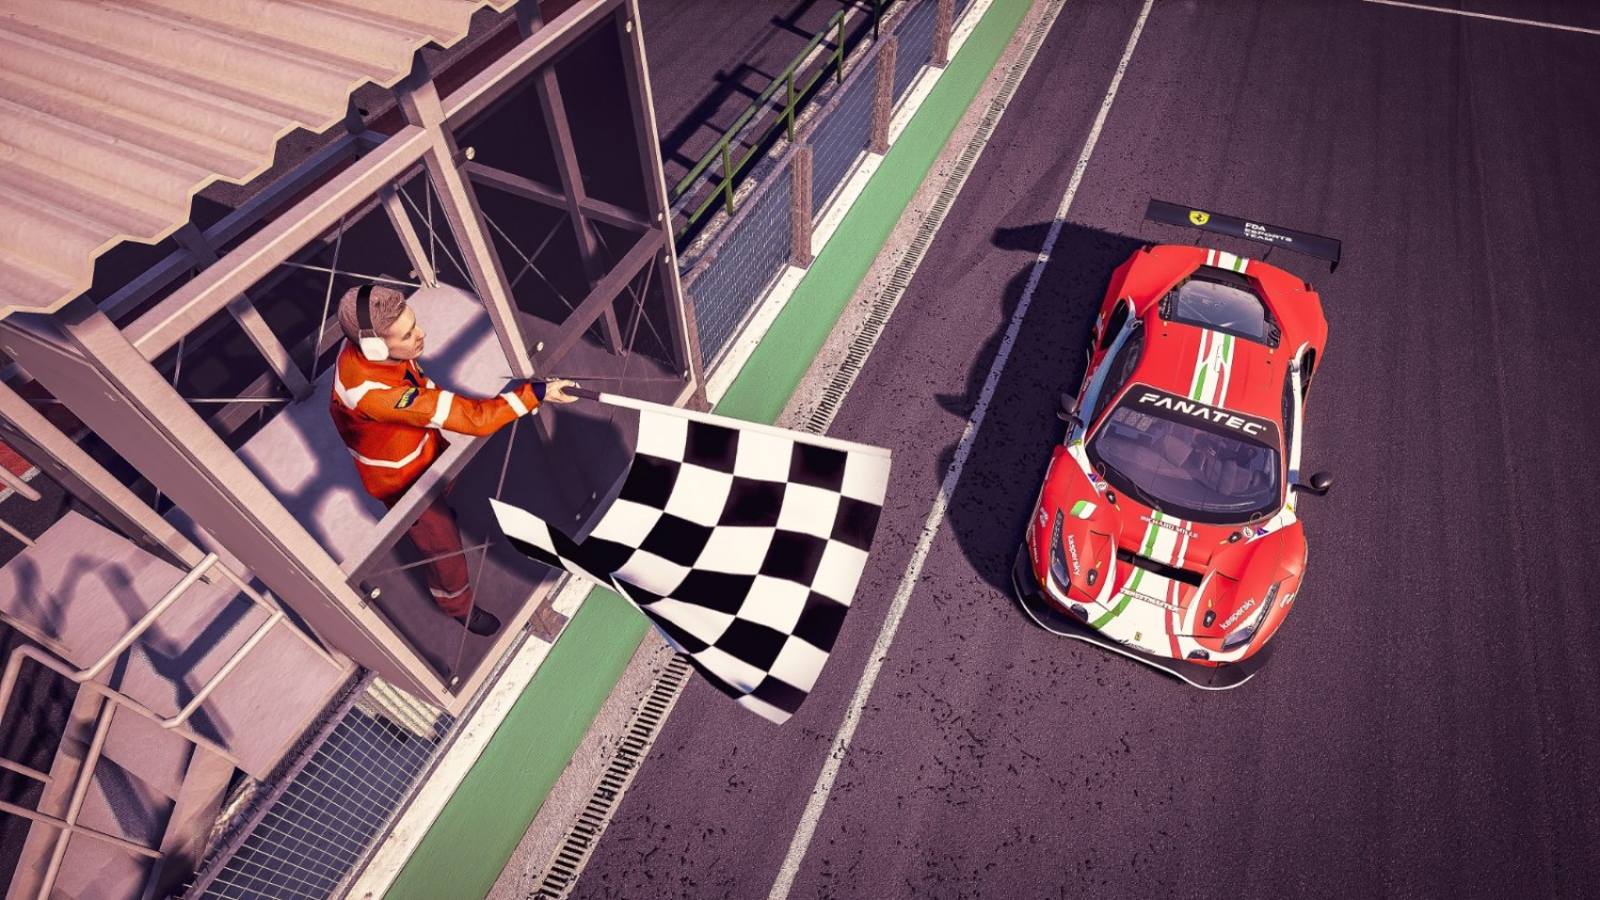 ESPORTS: Ferrari ace Tonizza opens up championship advantage with measured Hungaroring victory